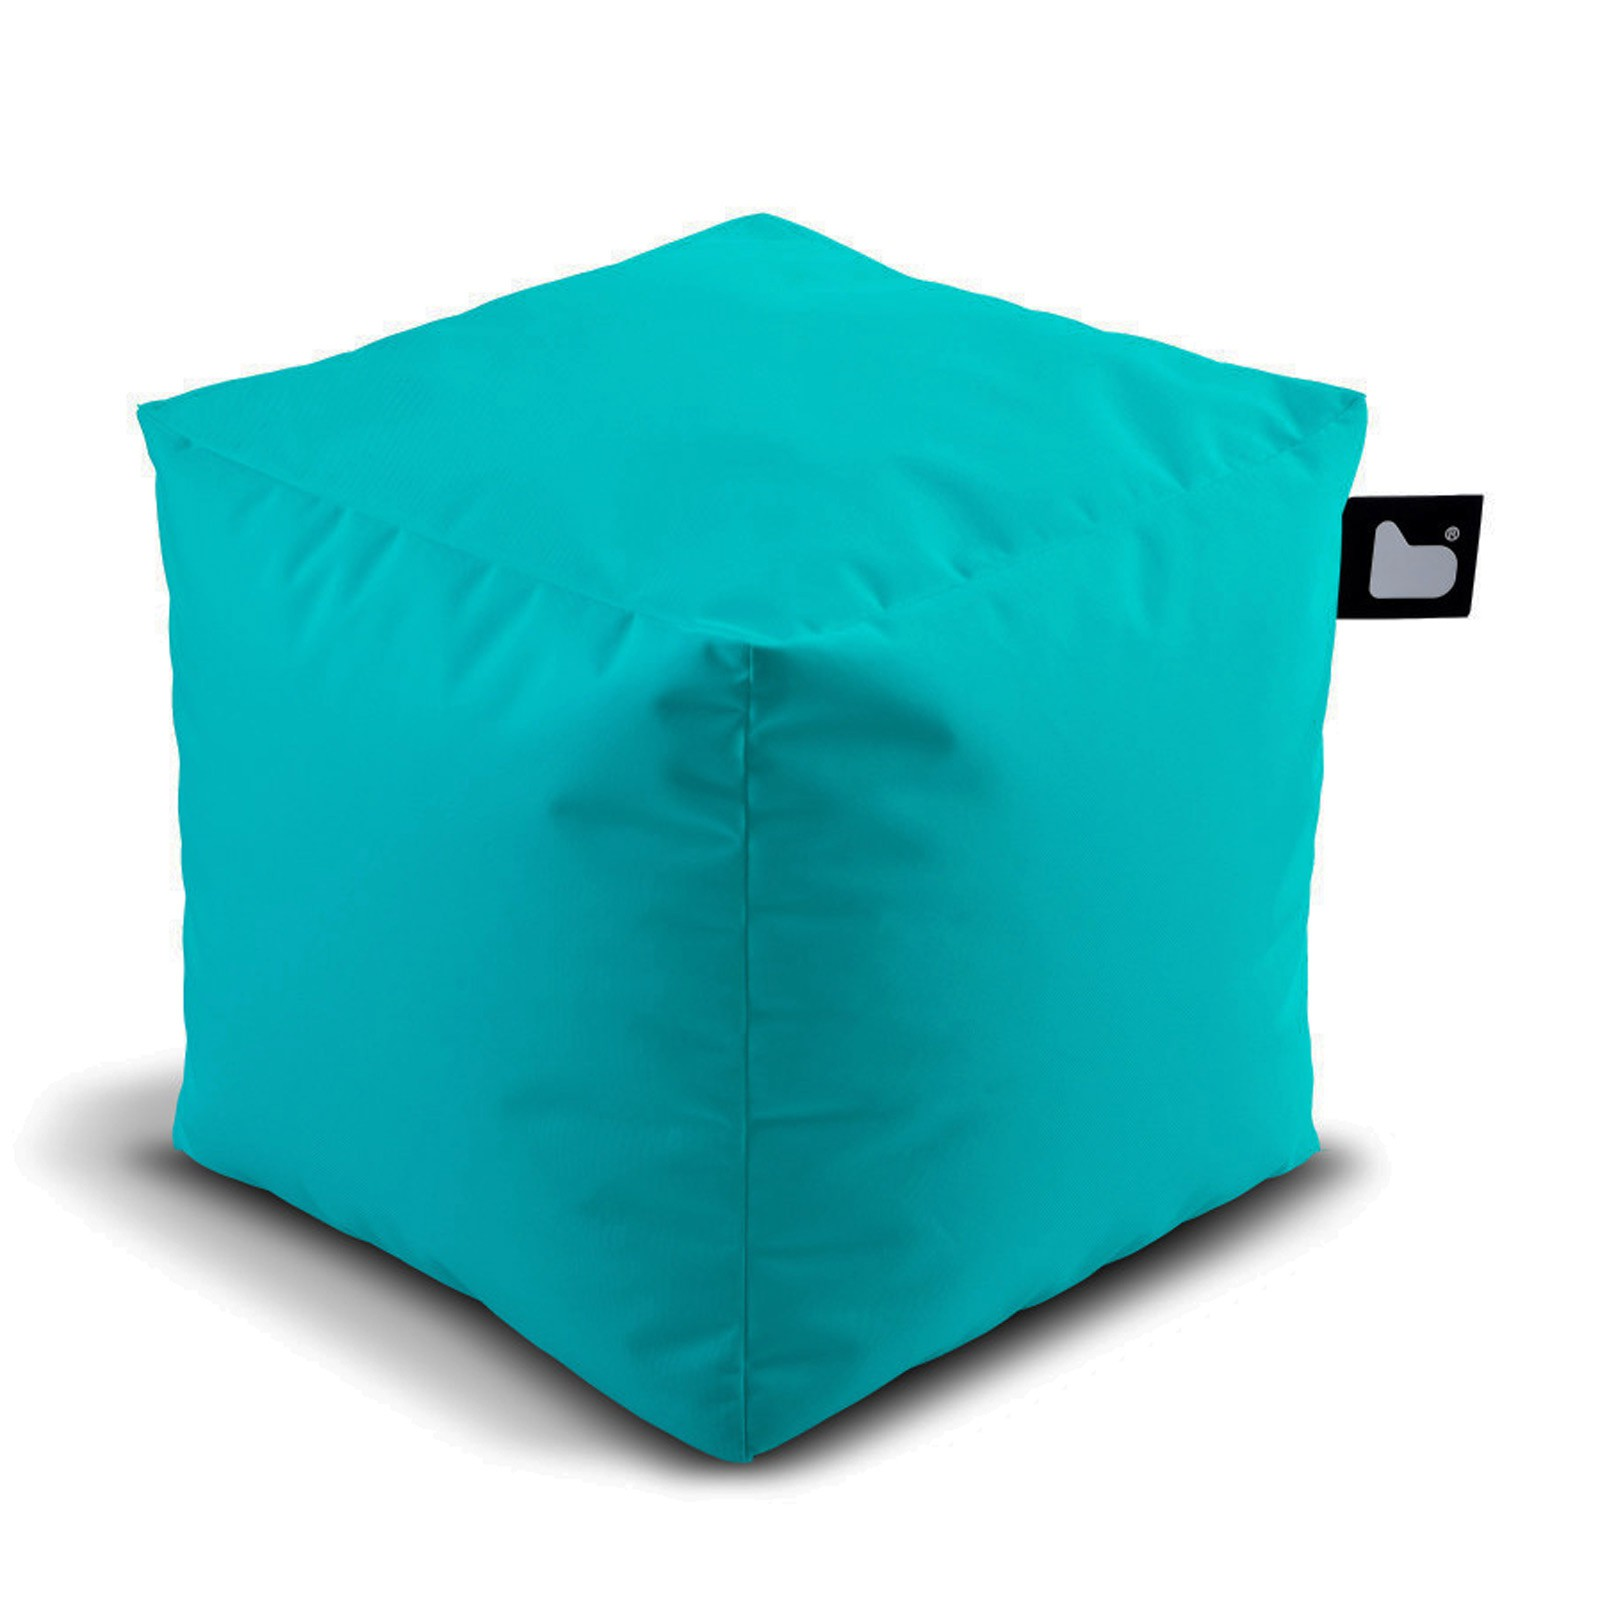 b-bag Extreme Lounging Sitzwürfel/Fußhocker Indoor-/Outdoor b-box Farbe Aqua